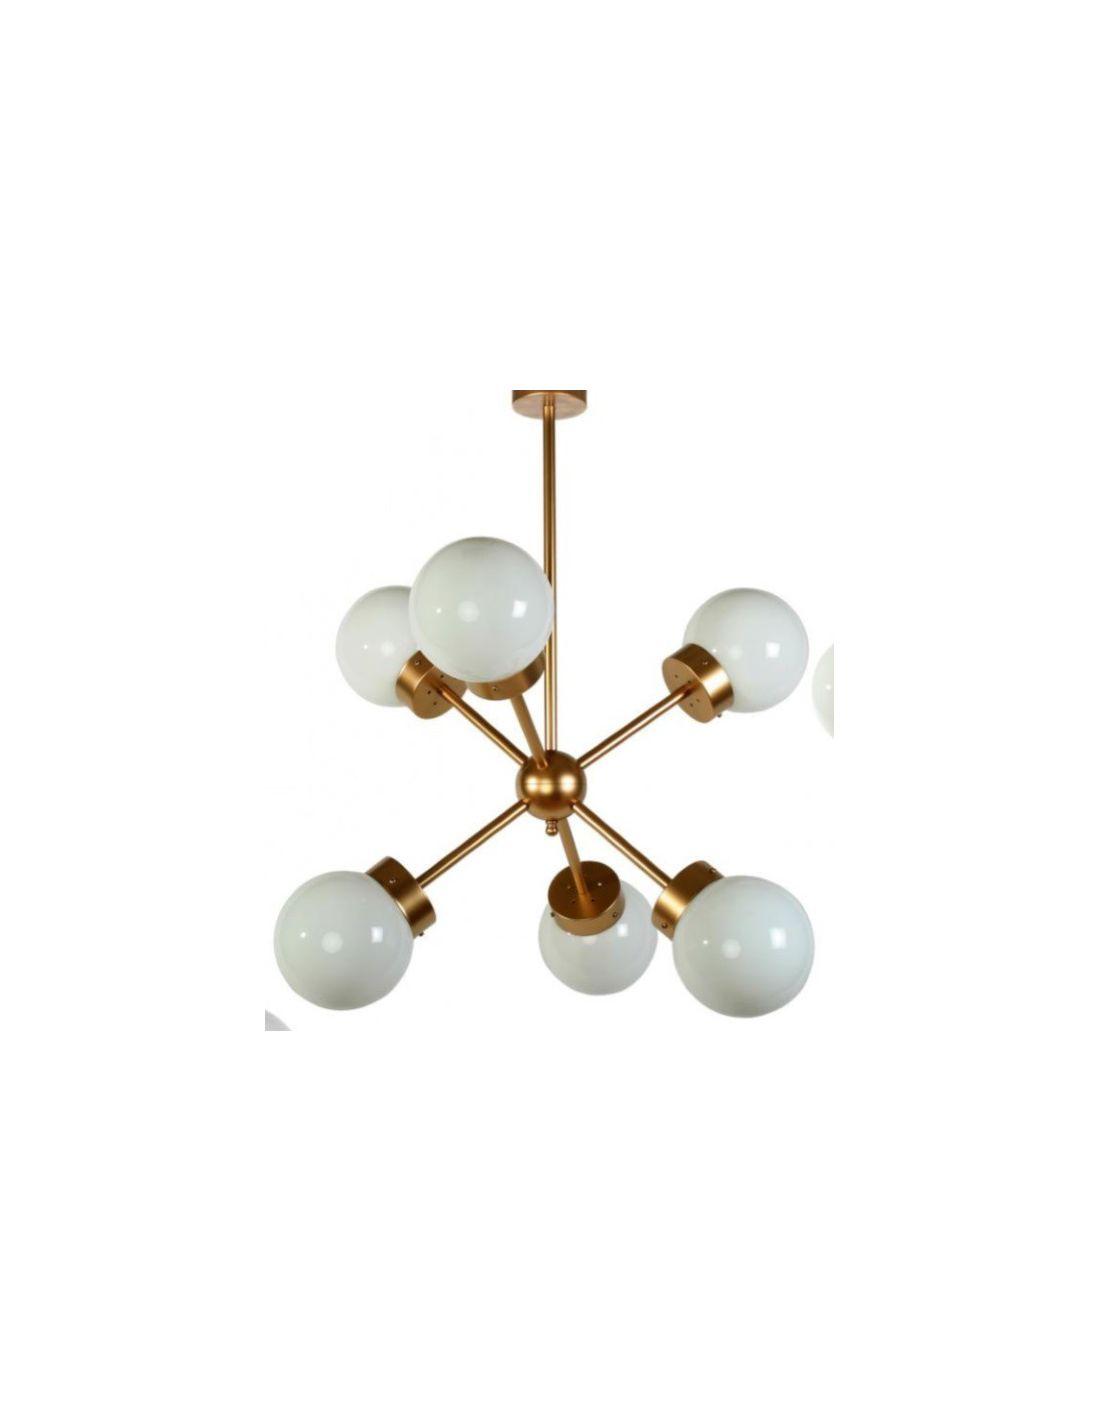 L mparas sputnik con tulipas opal o transparentes compra - Lamparas originales de techo ...